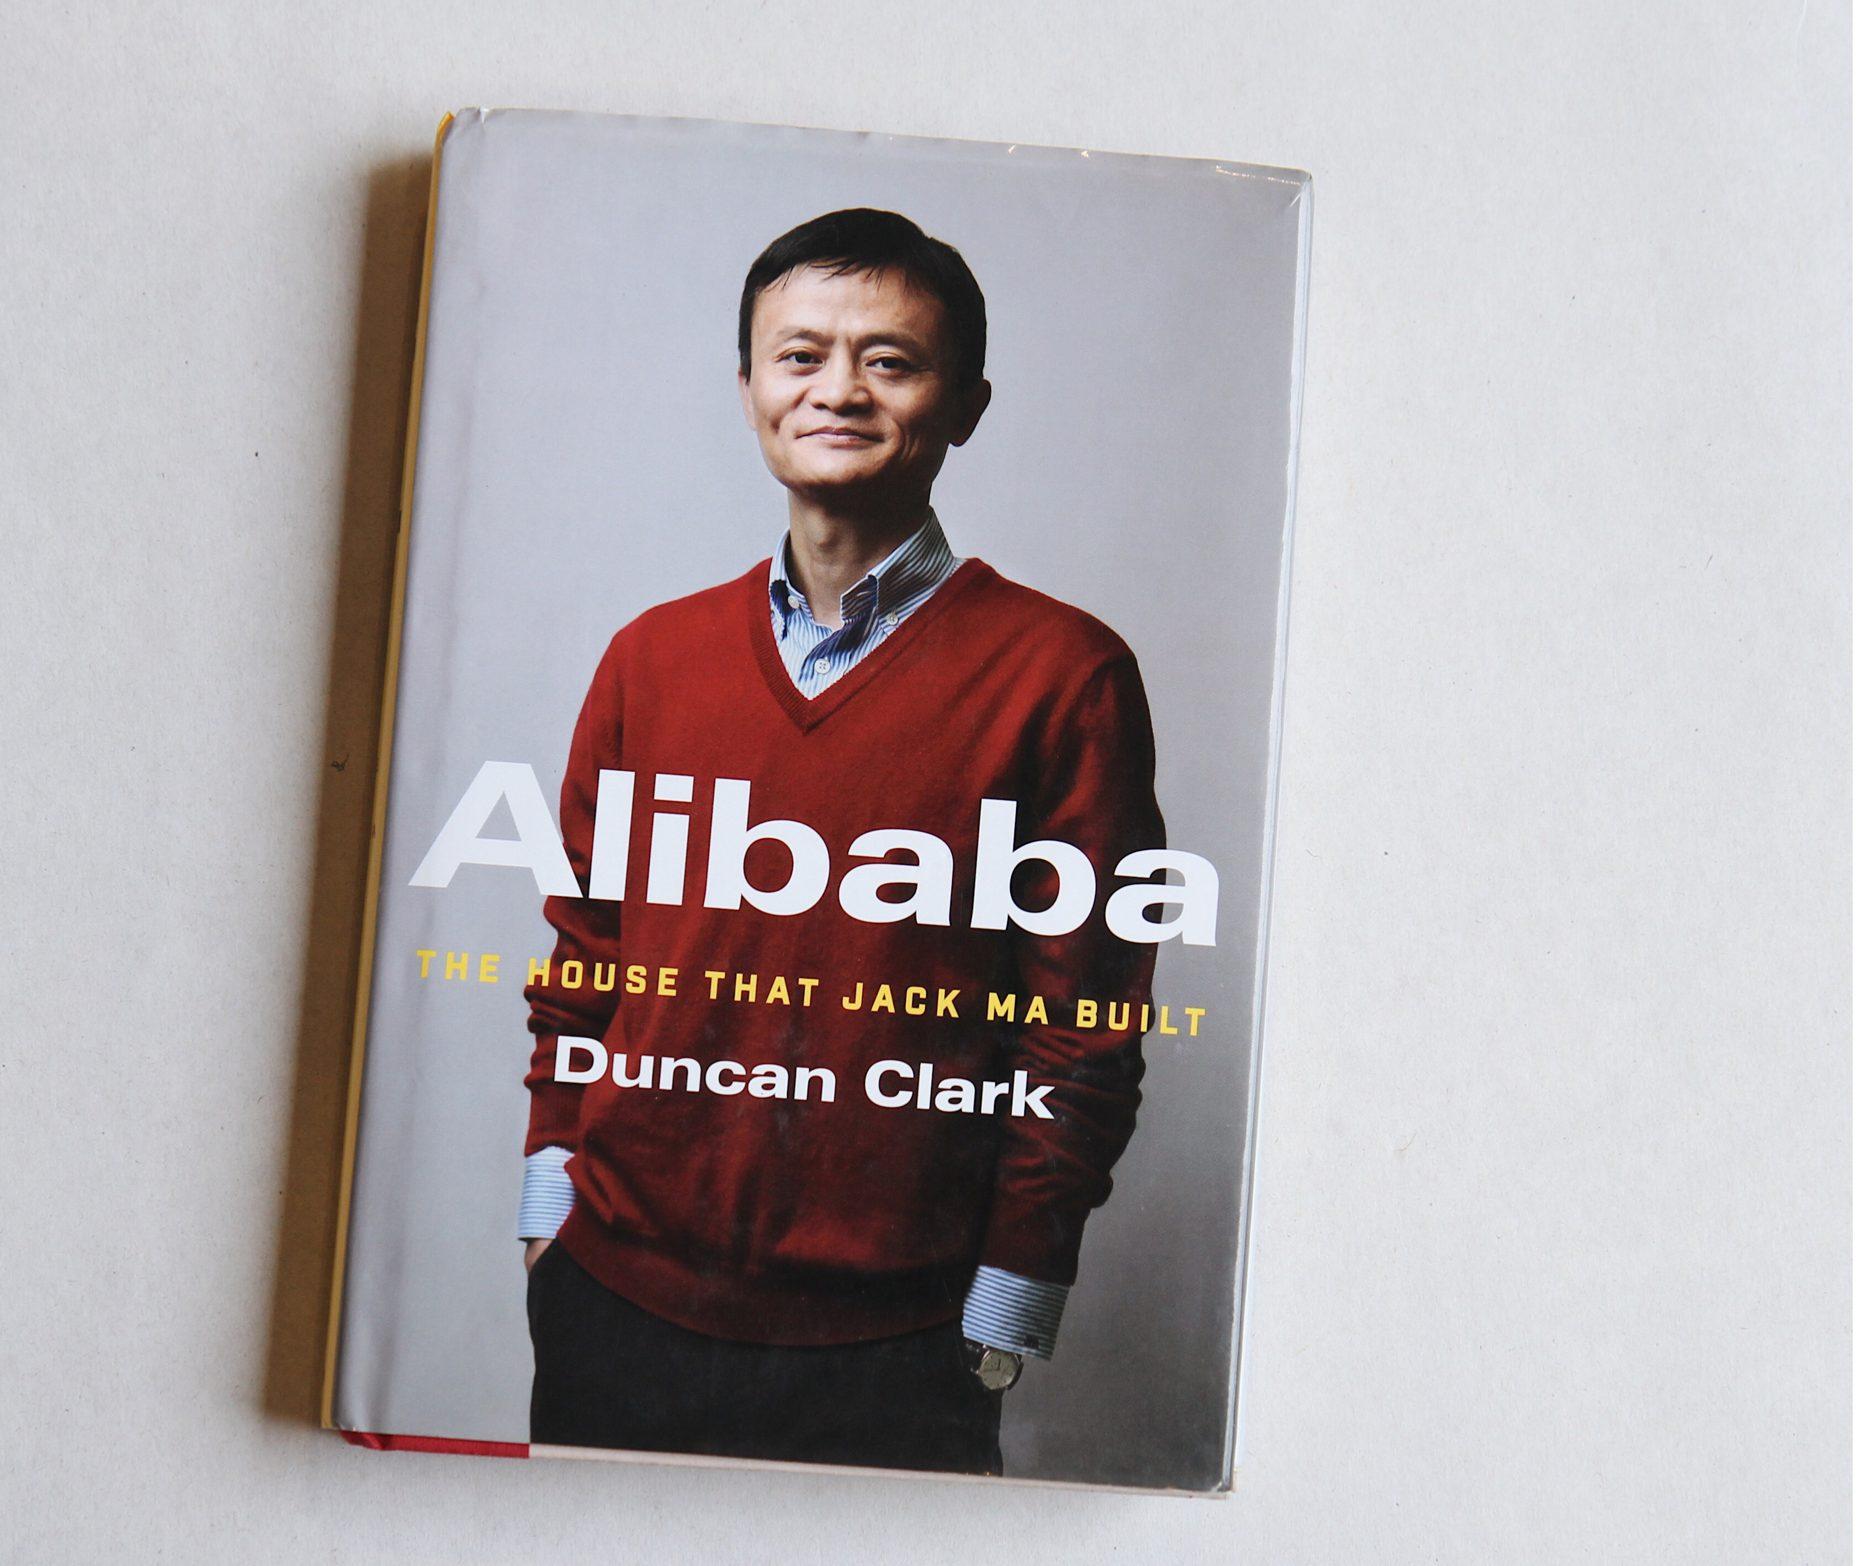 Alibaba The House that Jack Ma built Duncan Clark